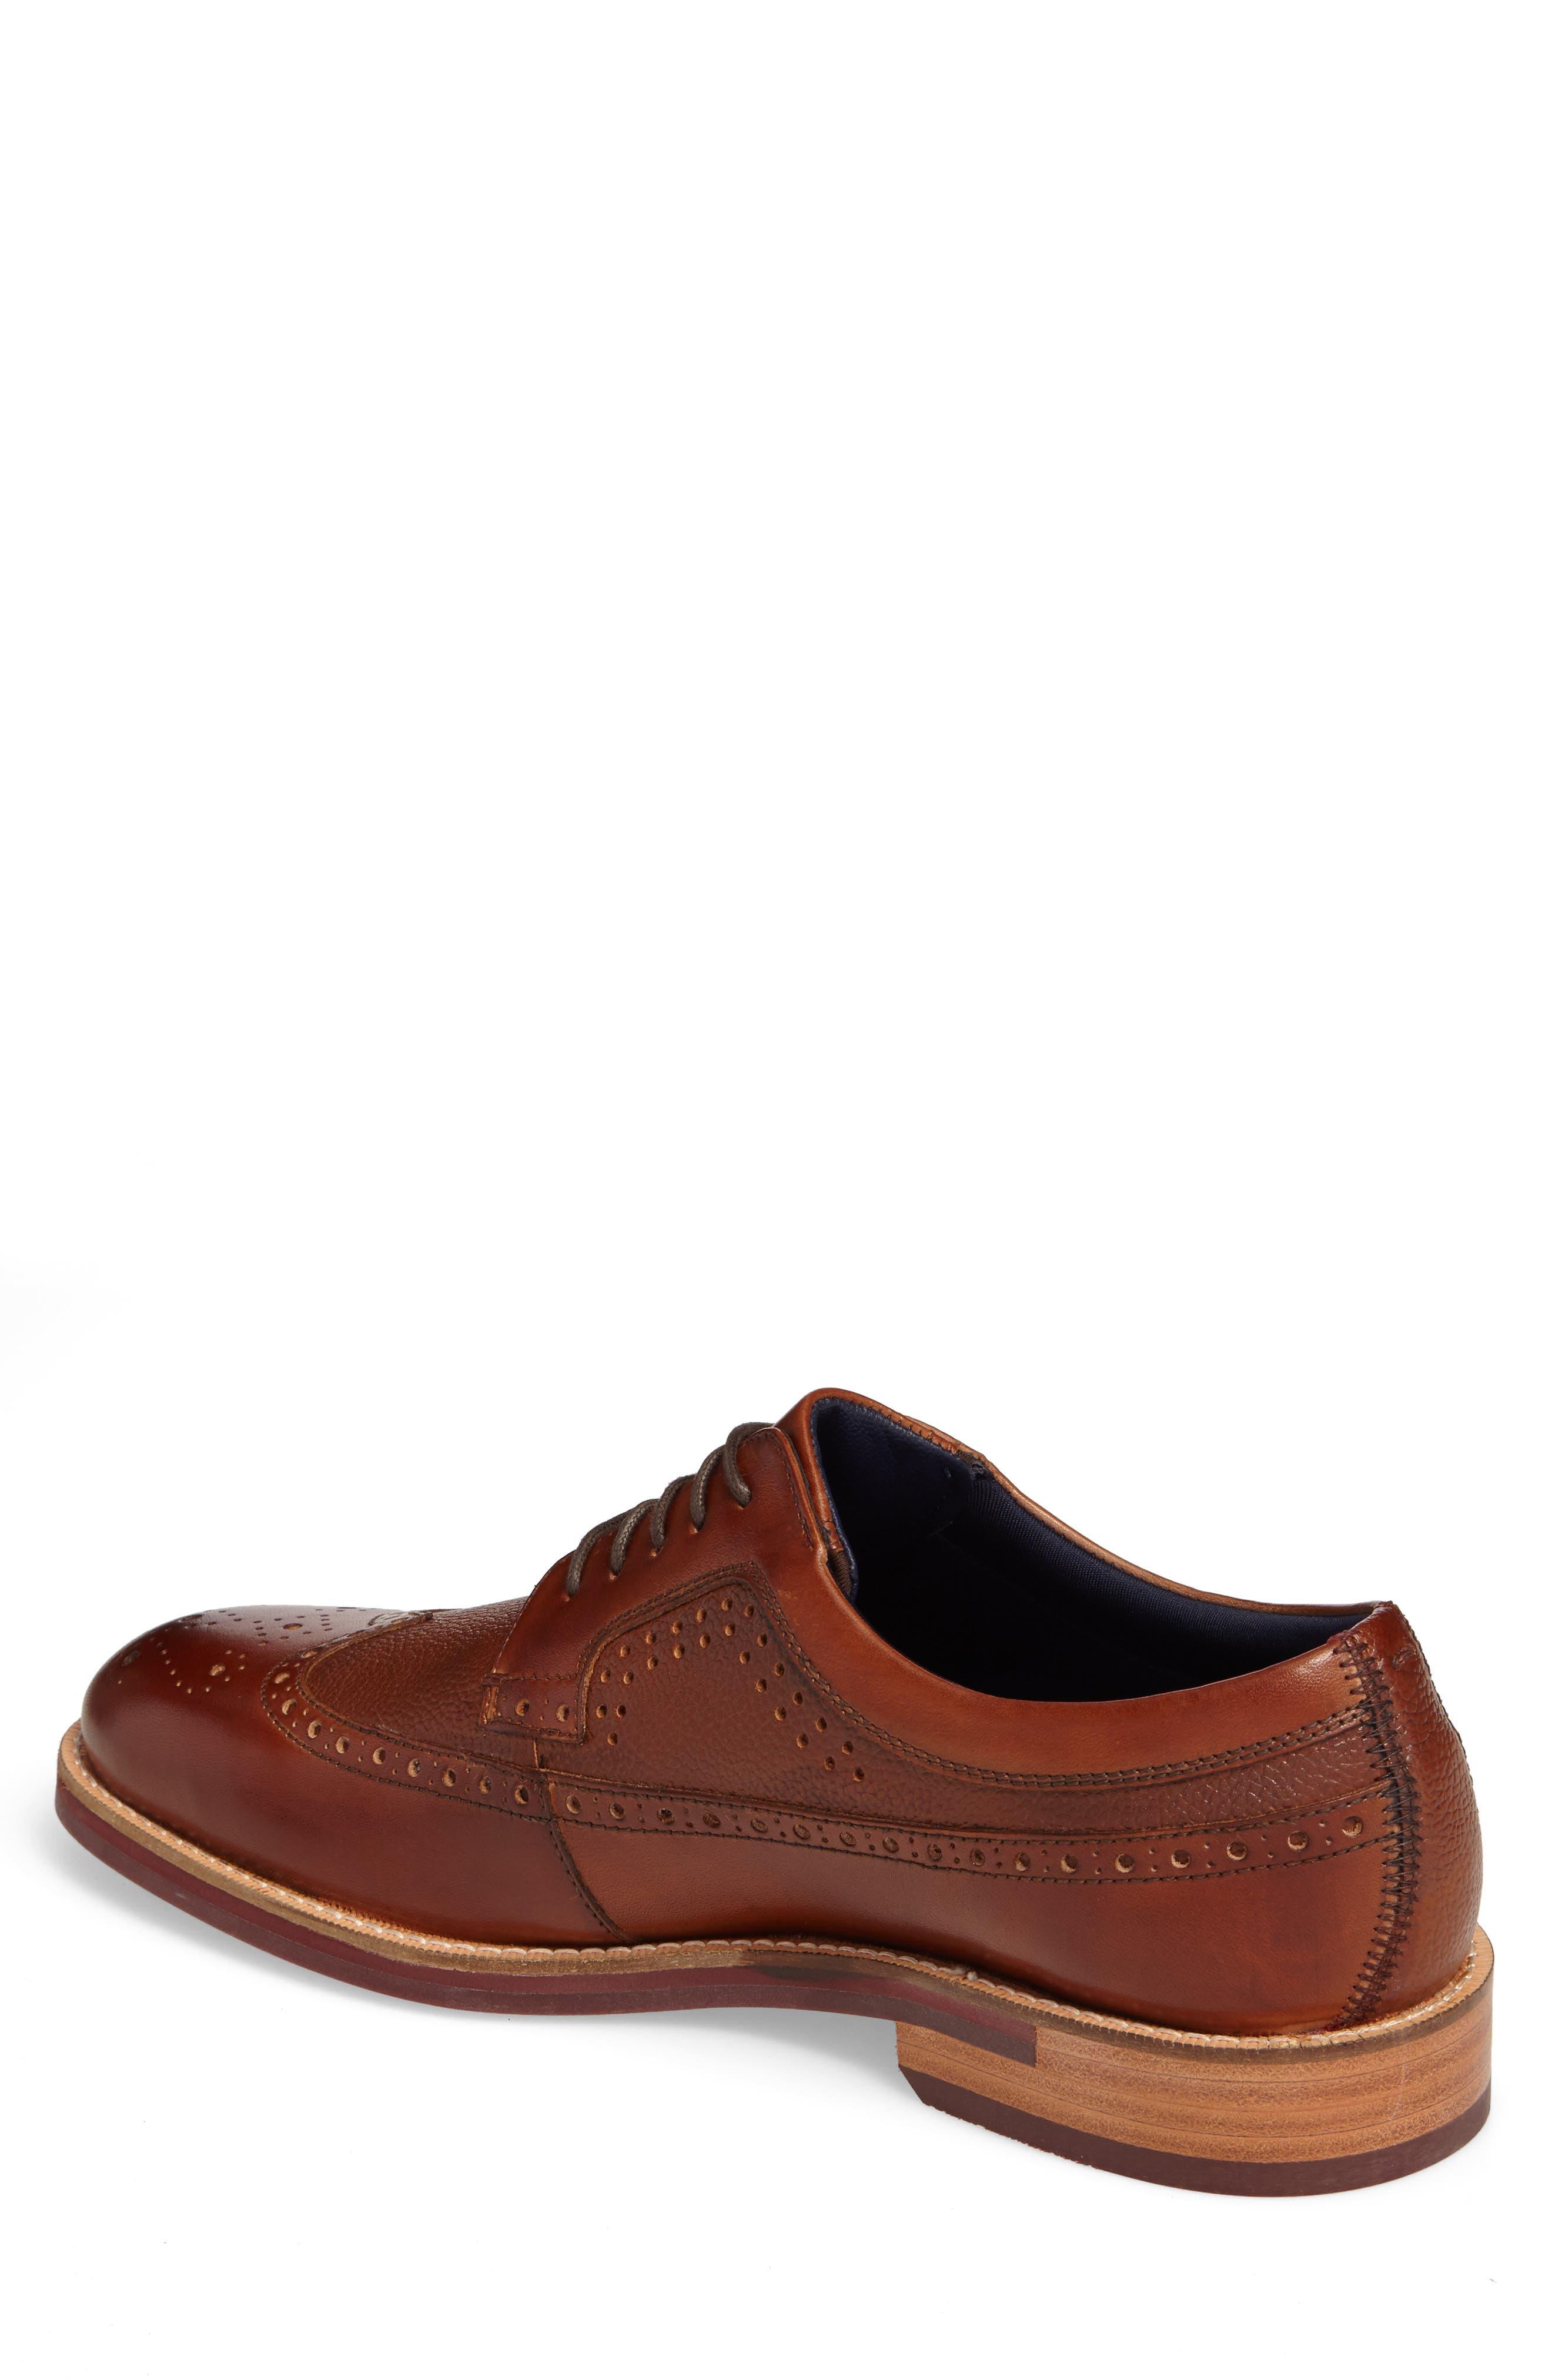 Deelani Longwing Derby,                             Alternate thumbnail 2, color,                             Tan Leather